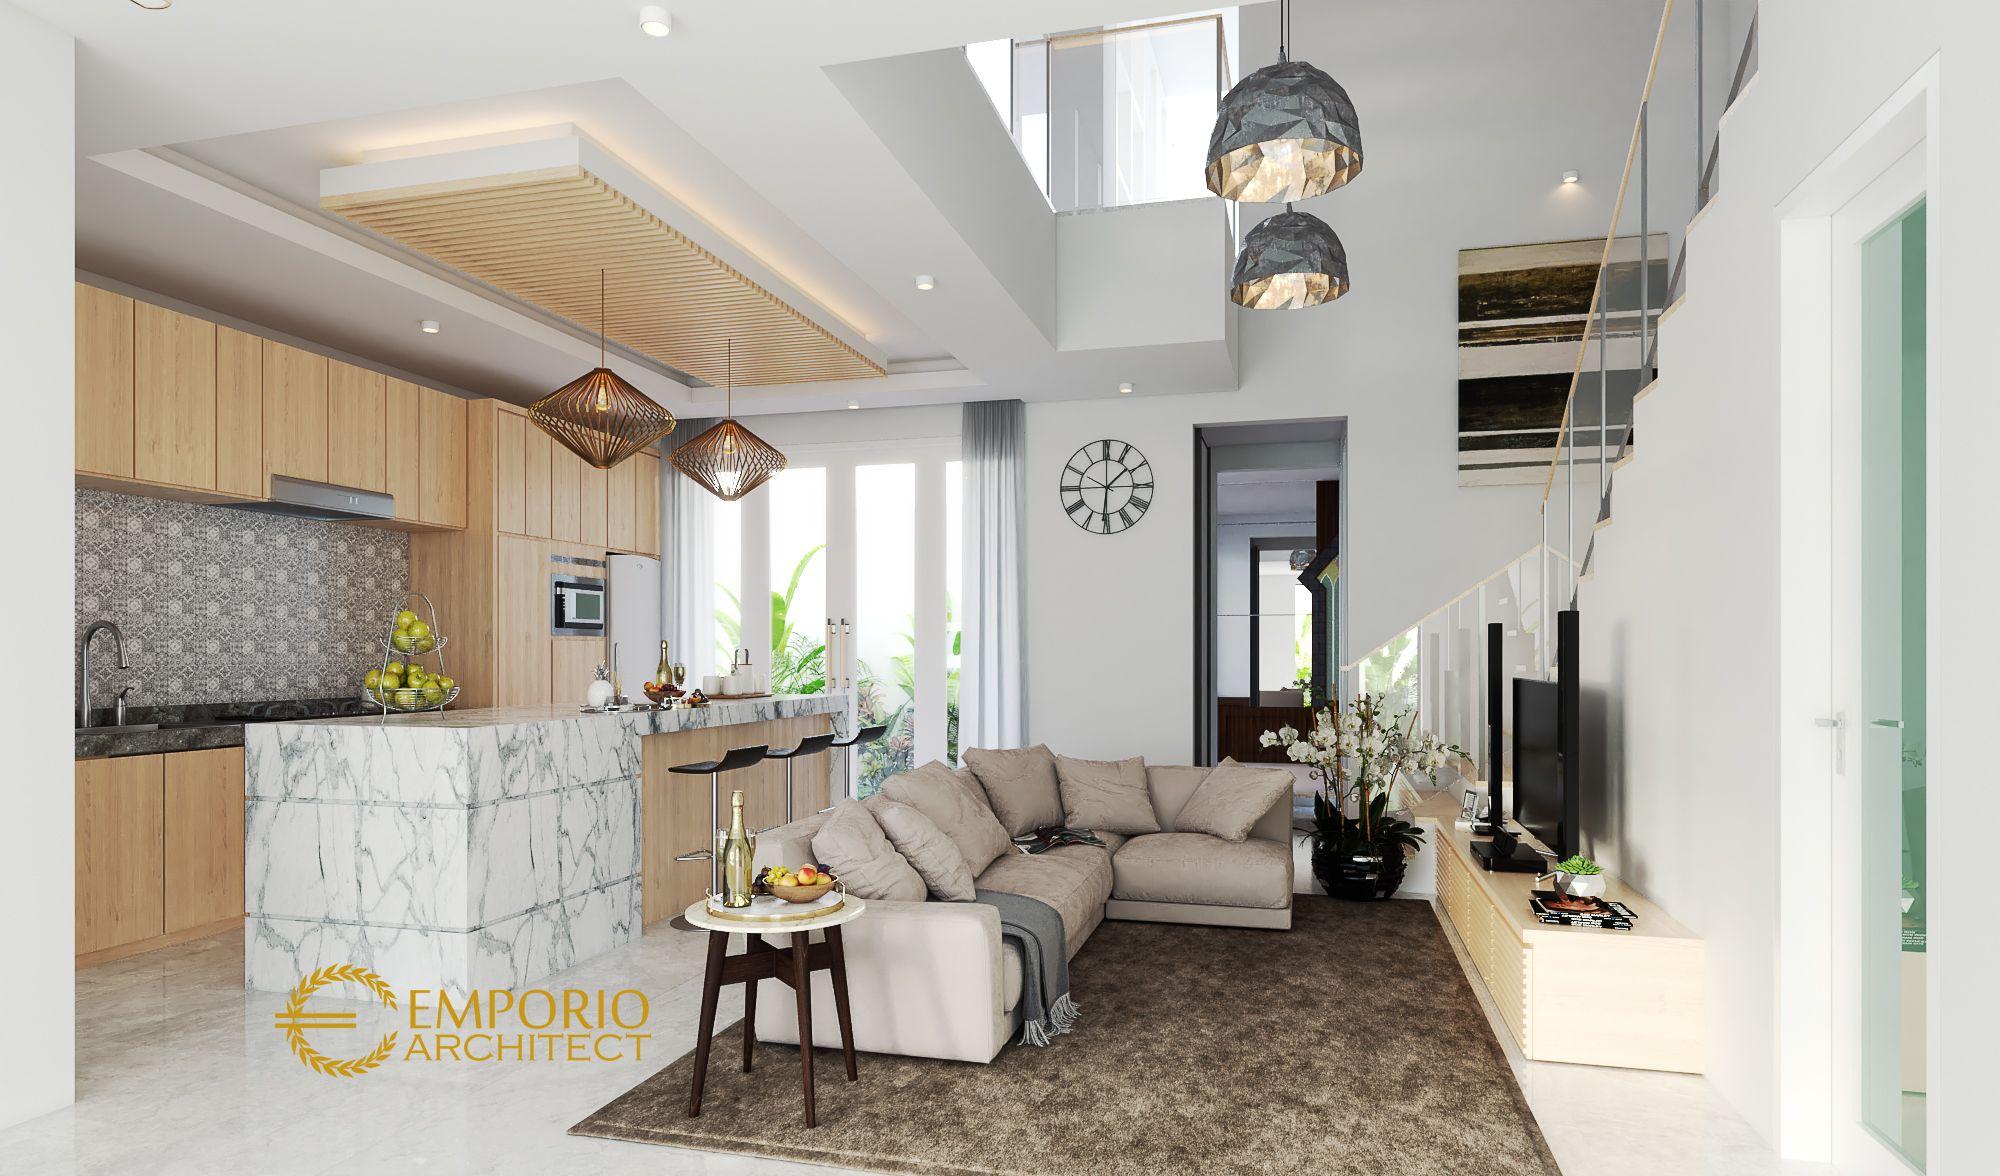 Desain Interior Rumah Minimalis Modern 2 Lantai Cek Bahan Bangunan